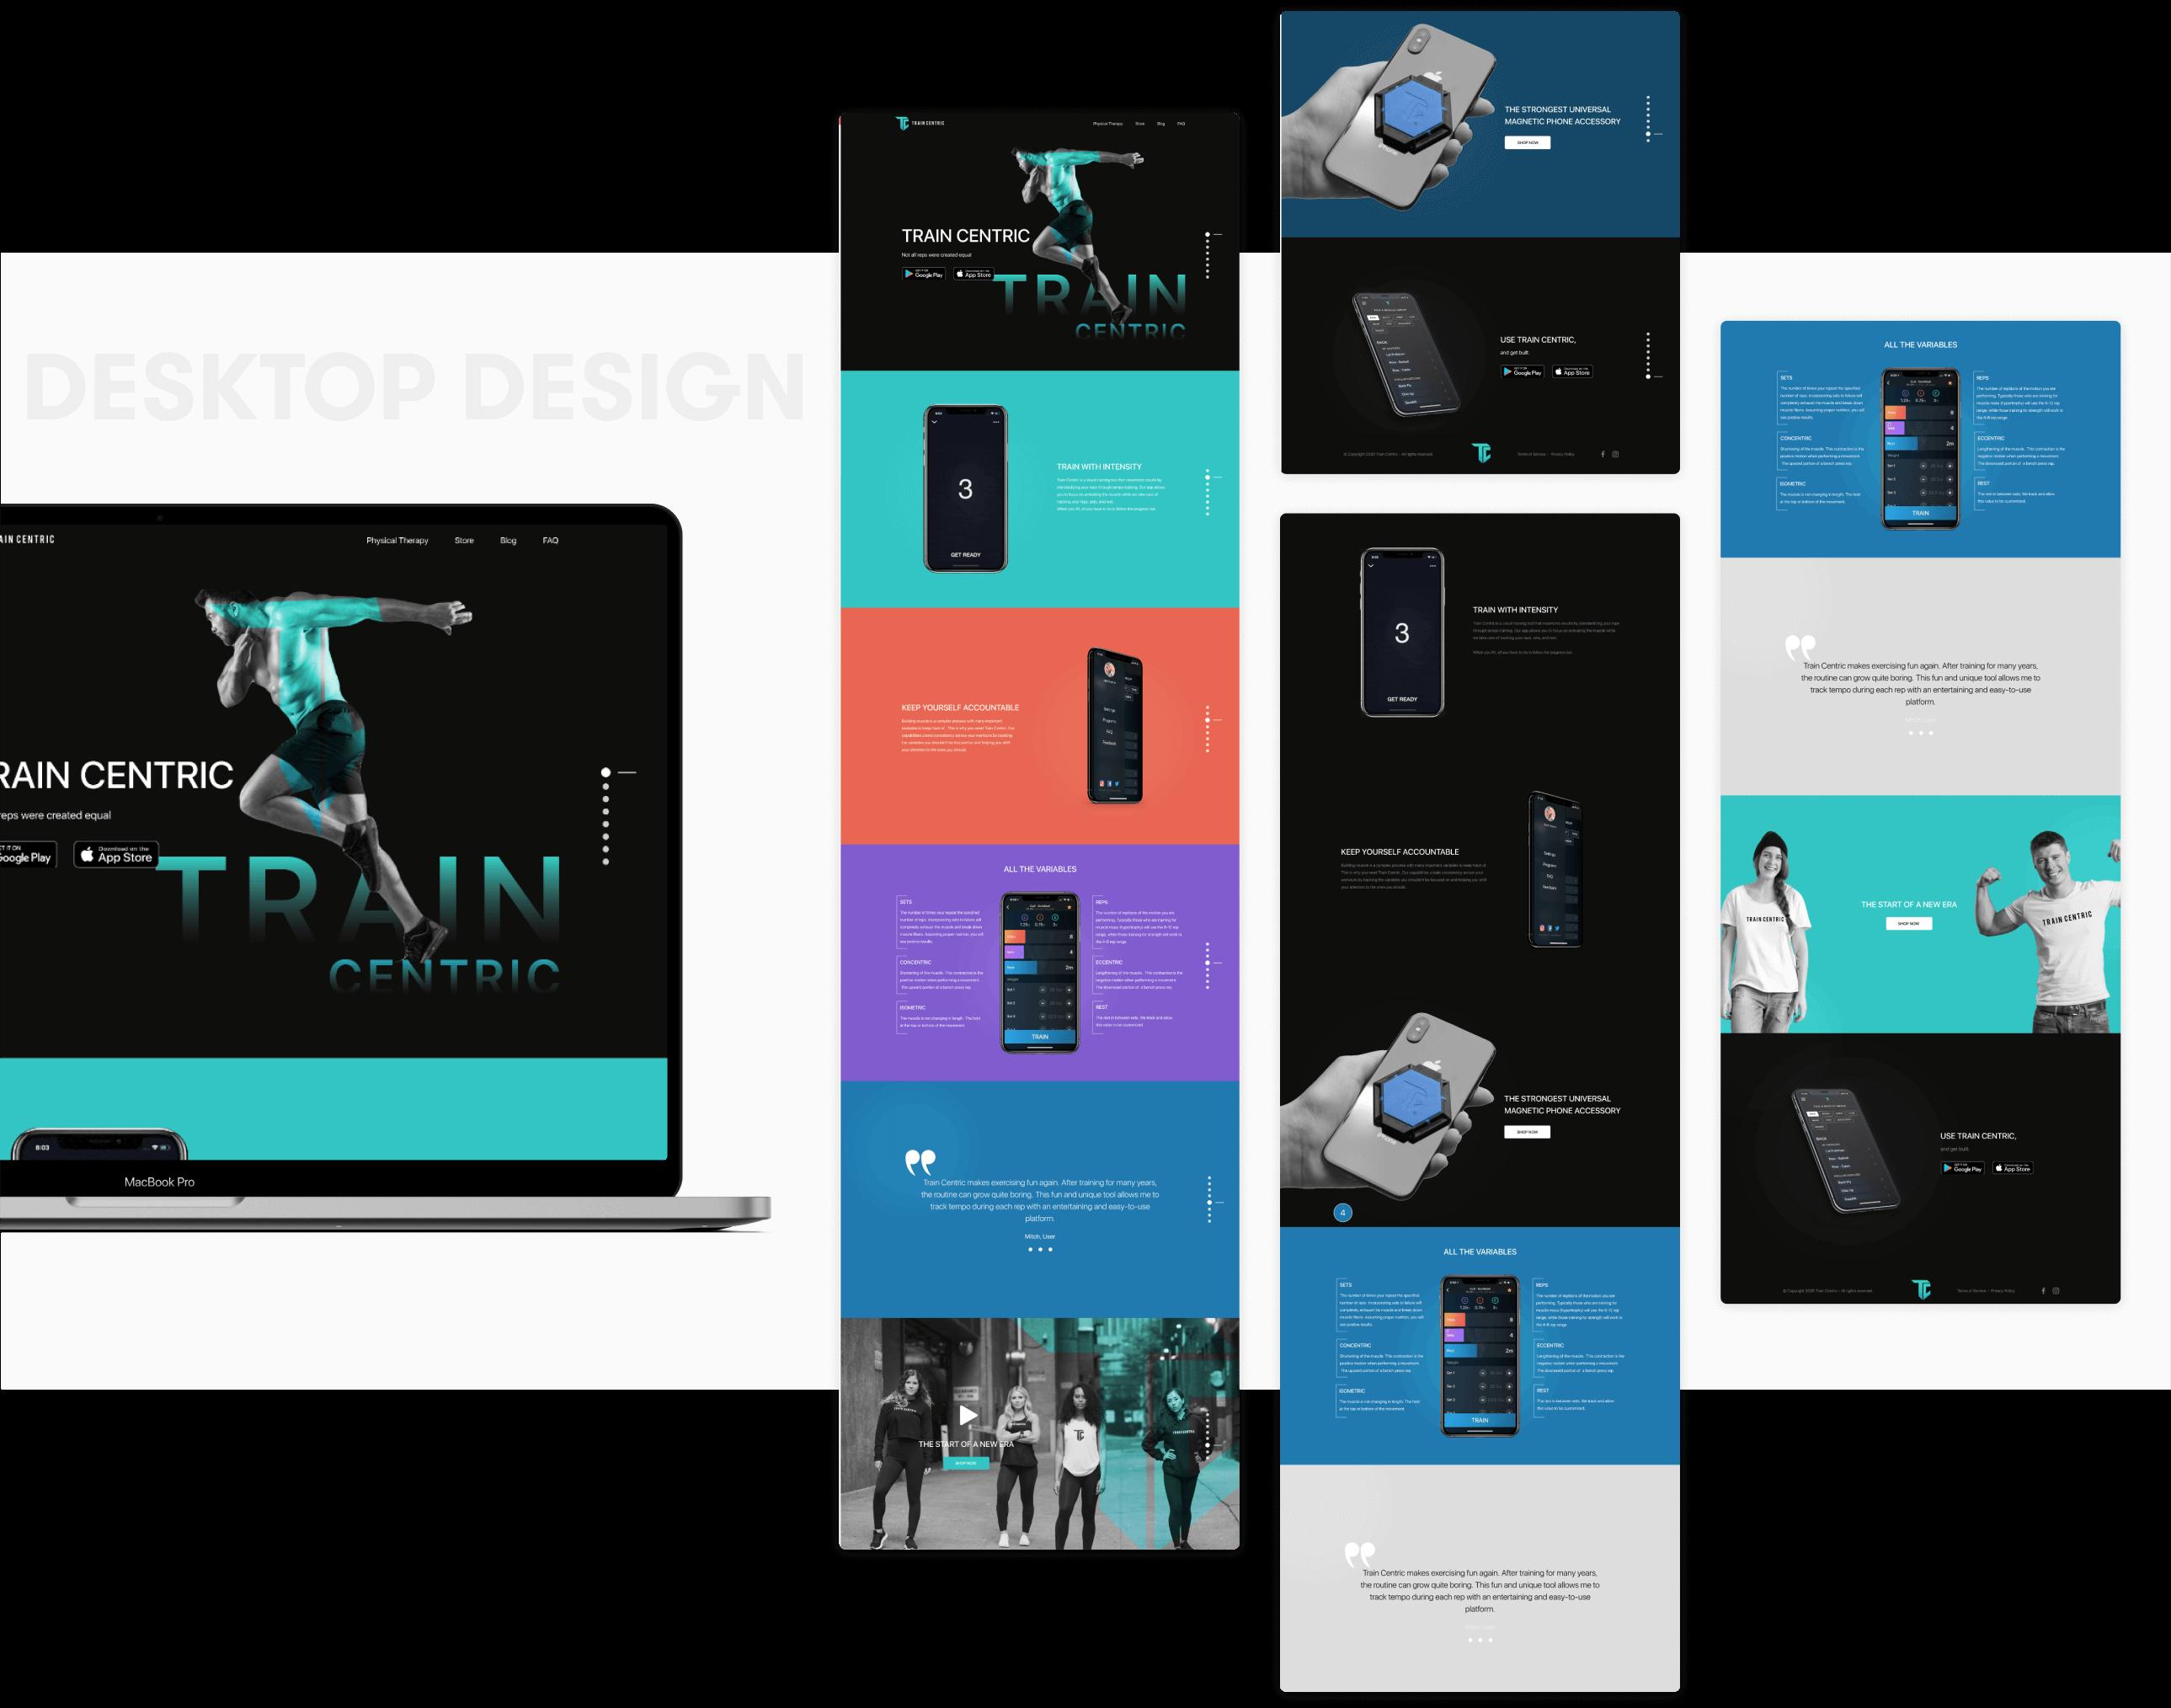 Train Centric  Desktop | Design and development by wowdesign